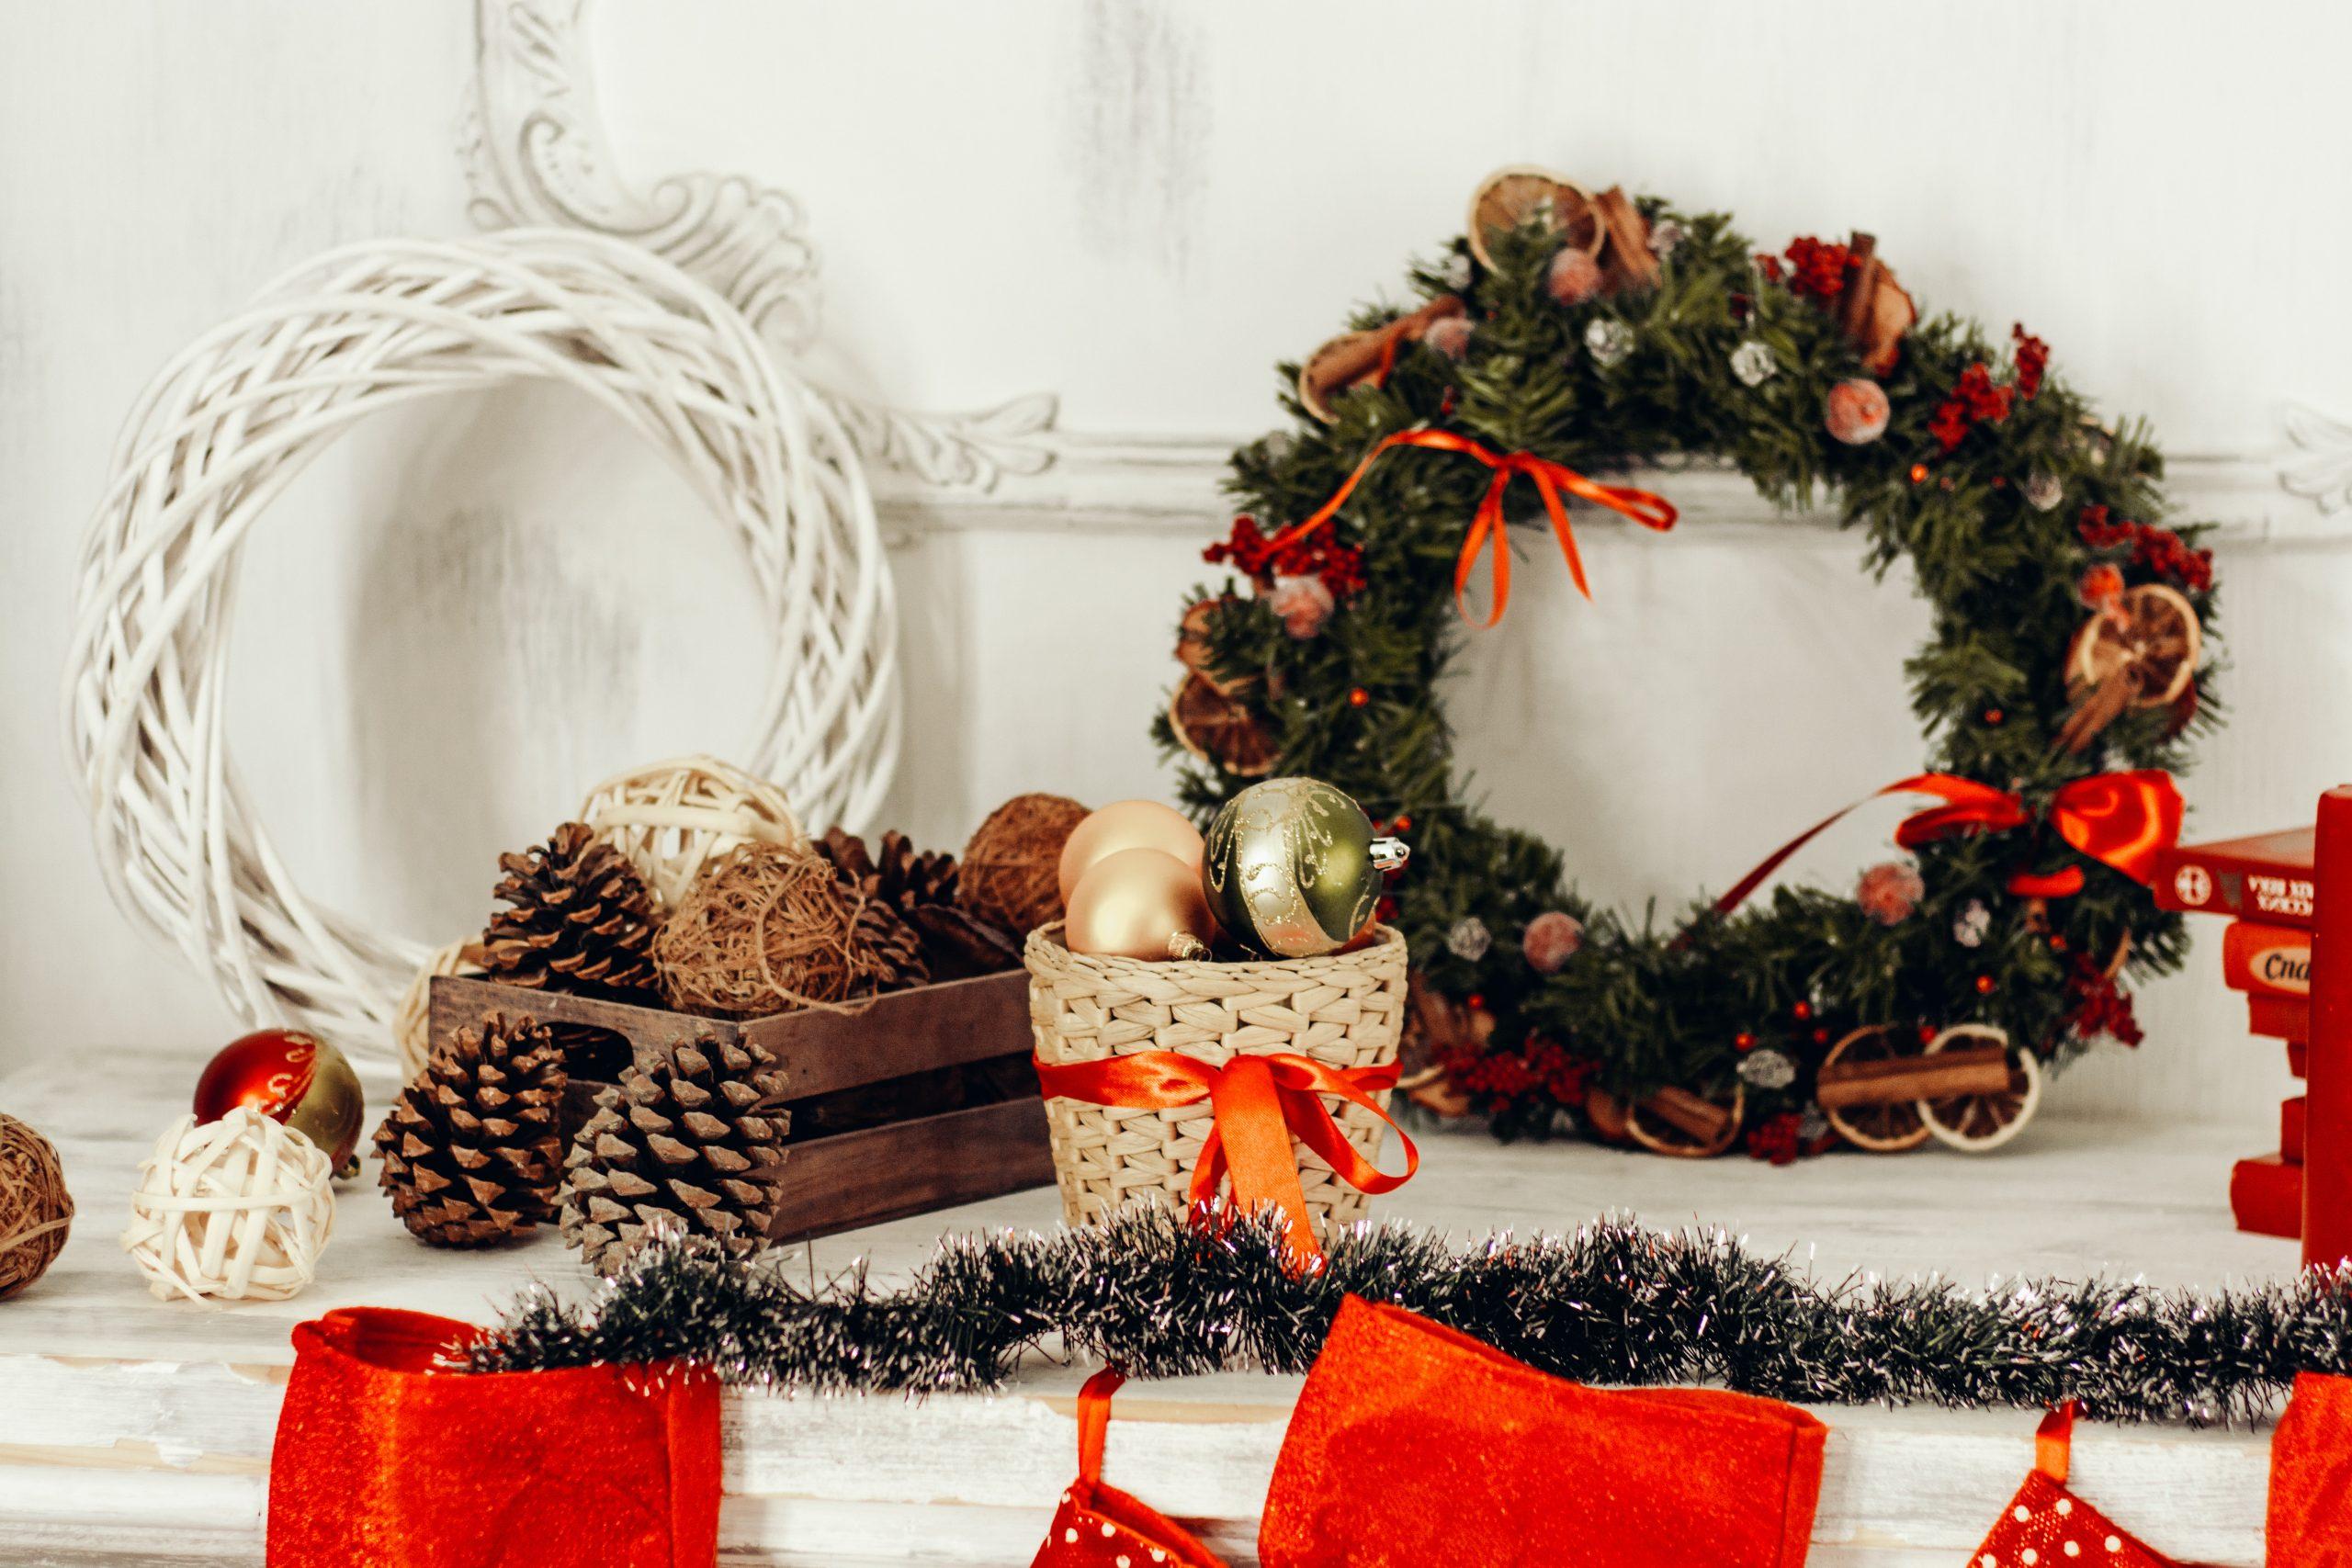 TQUK's Christmas Service Times 2020